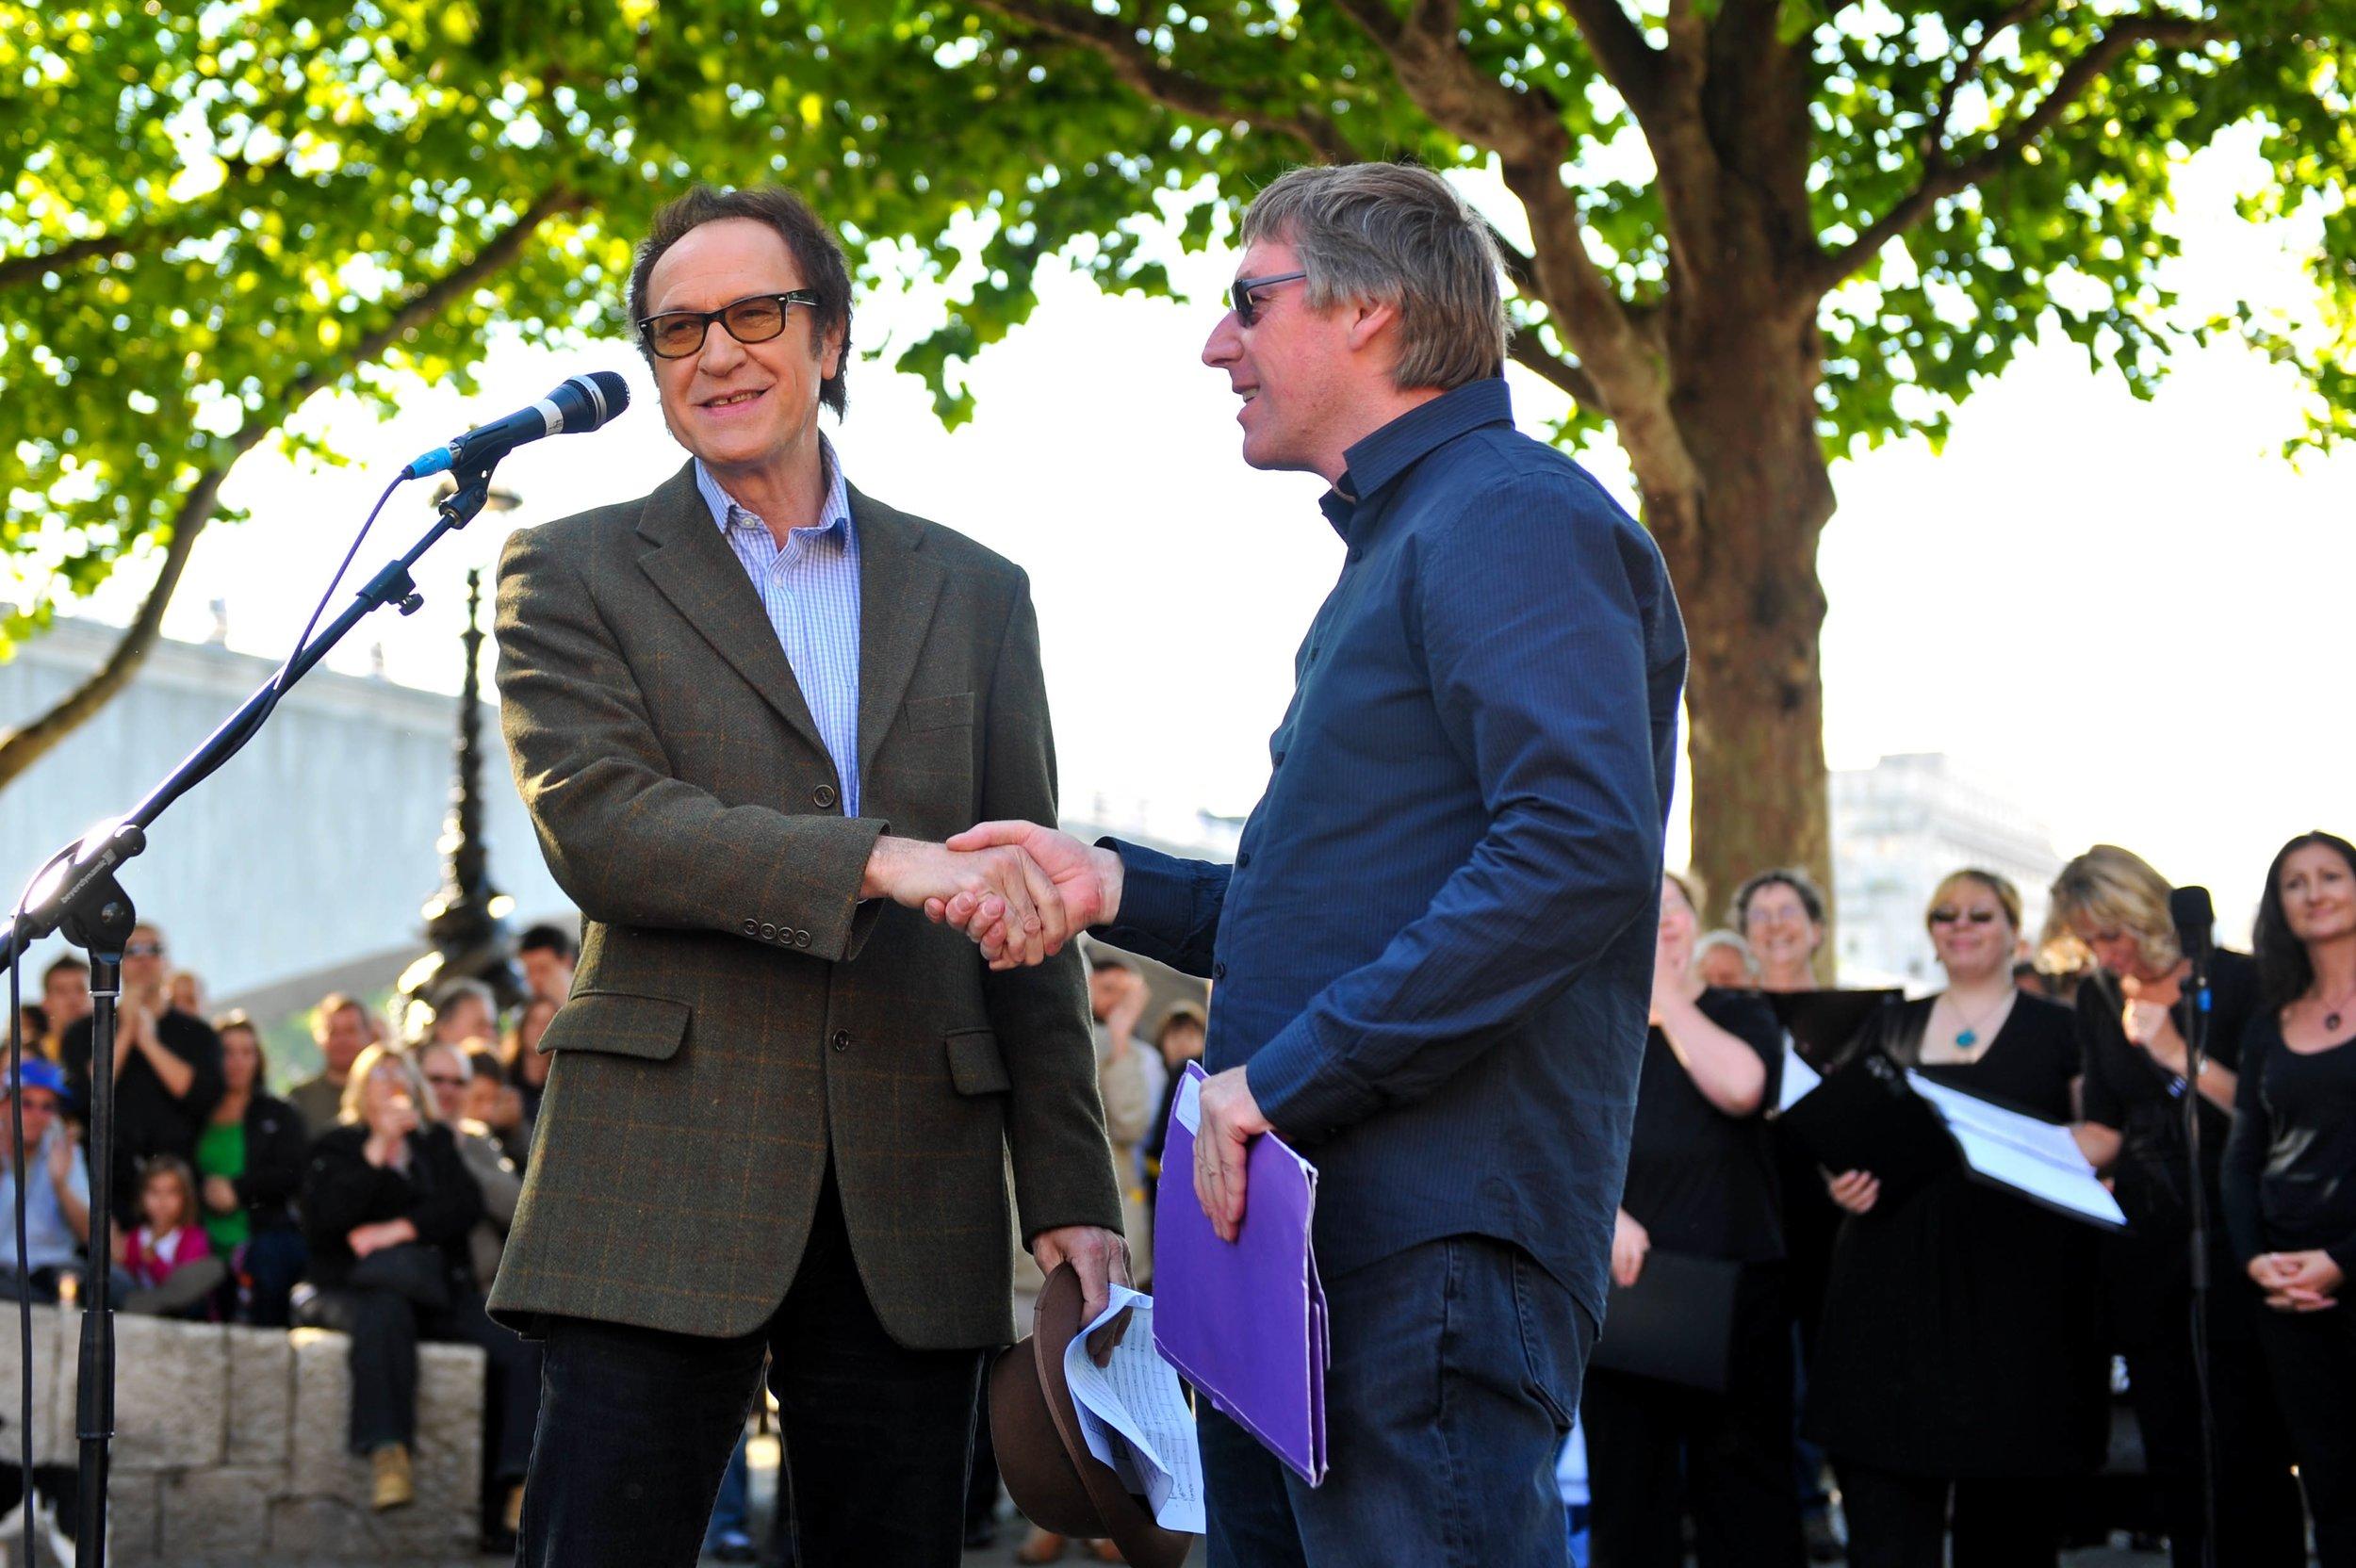 With Sir Ray Davies at Waterloo Bridge